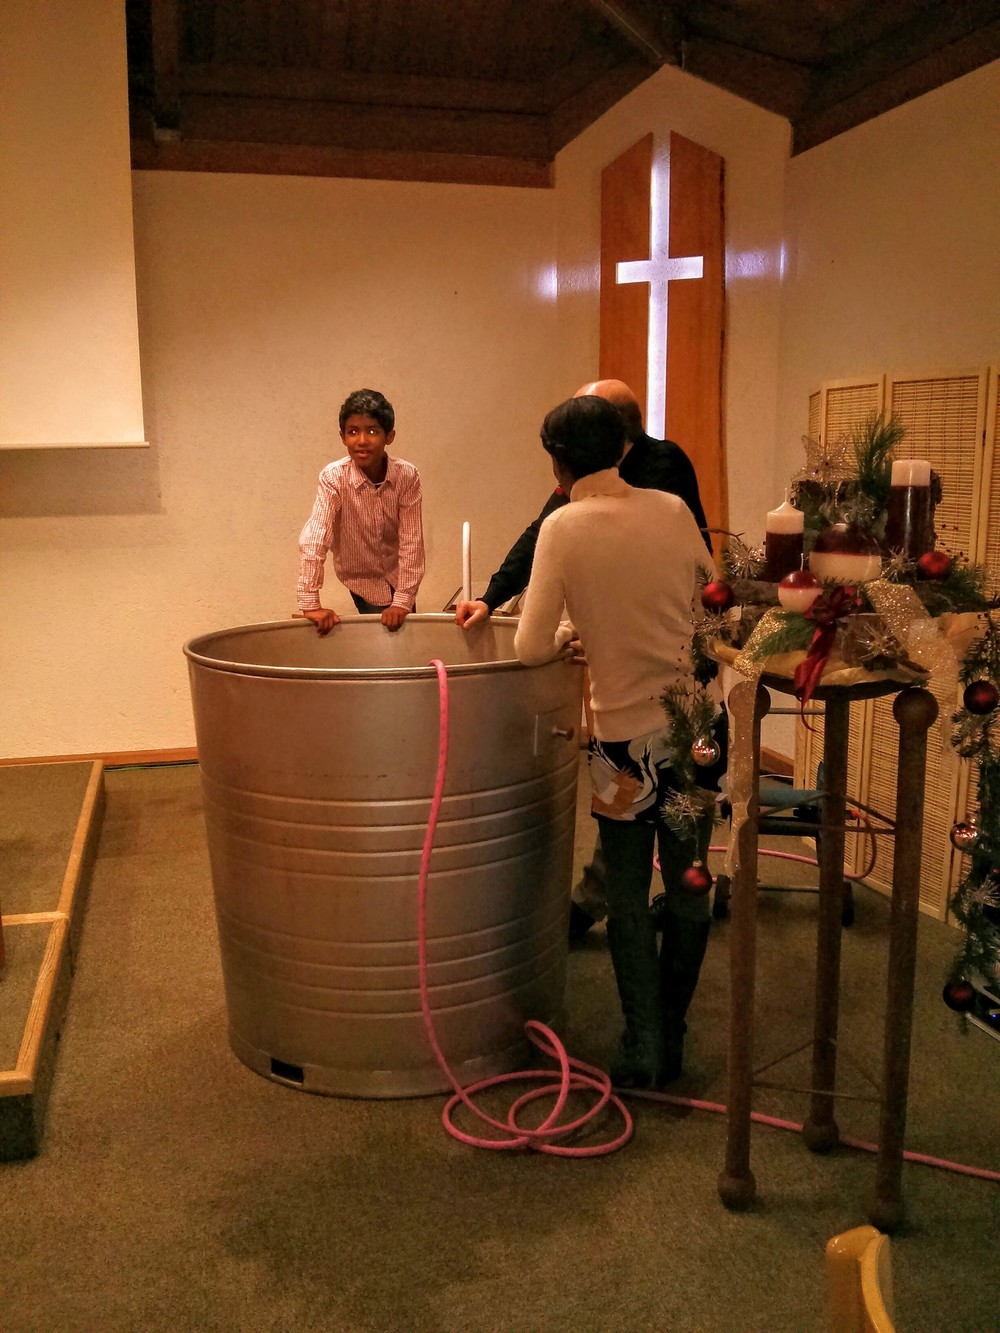 The baptism tank